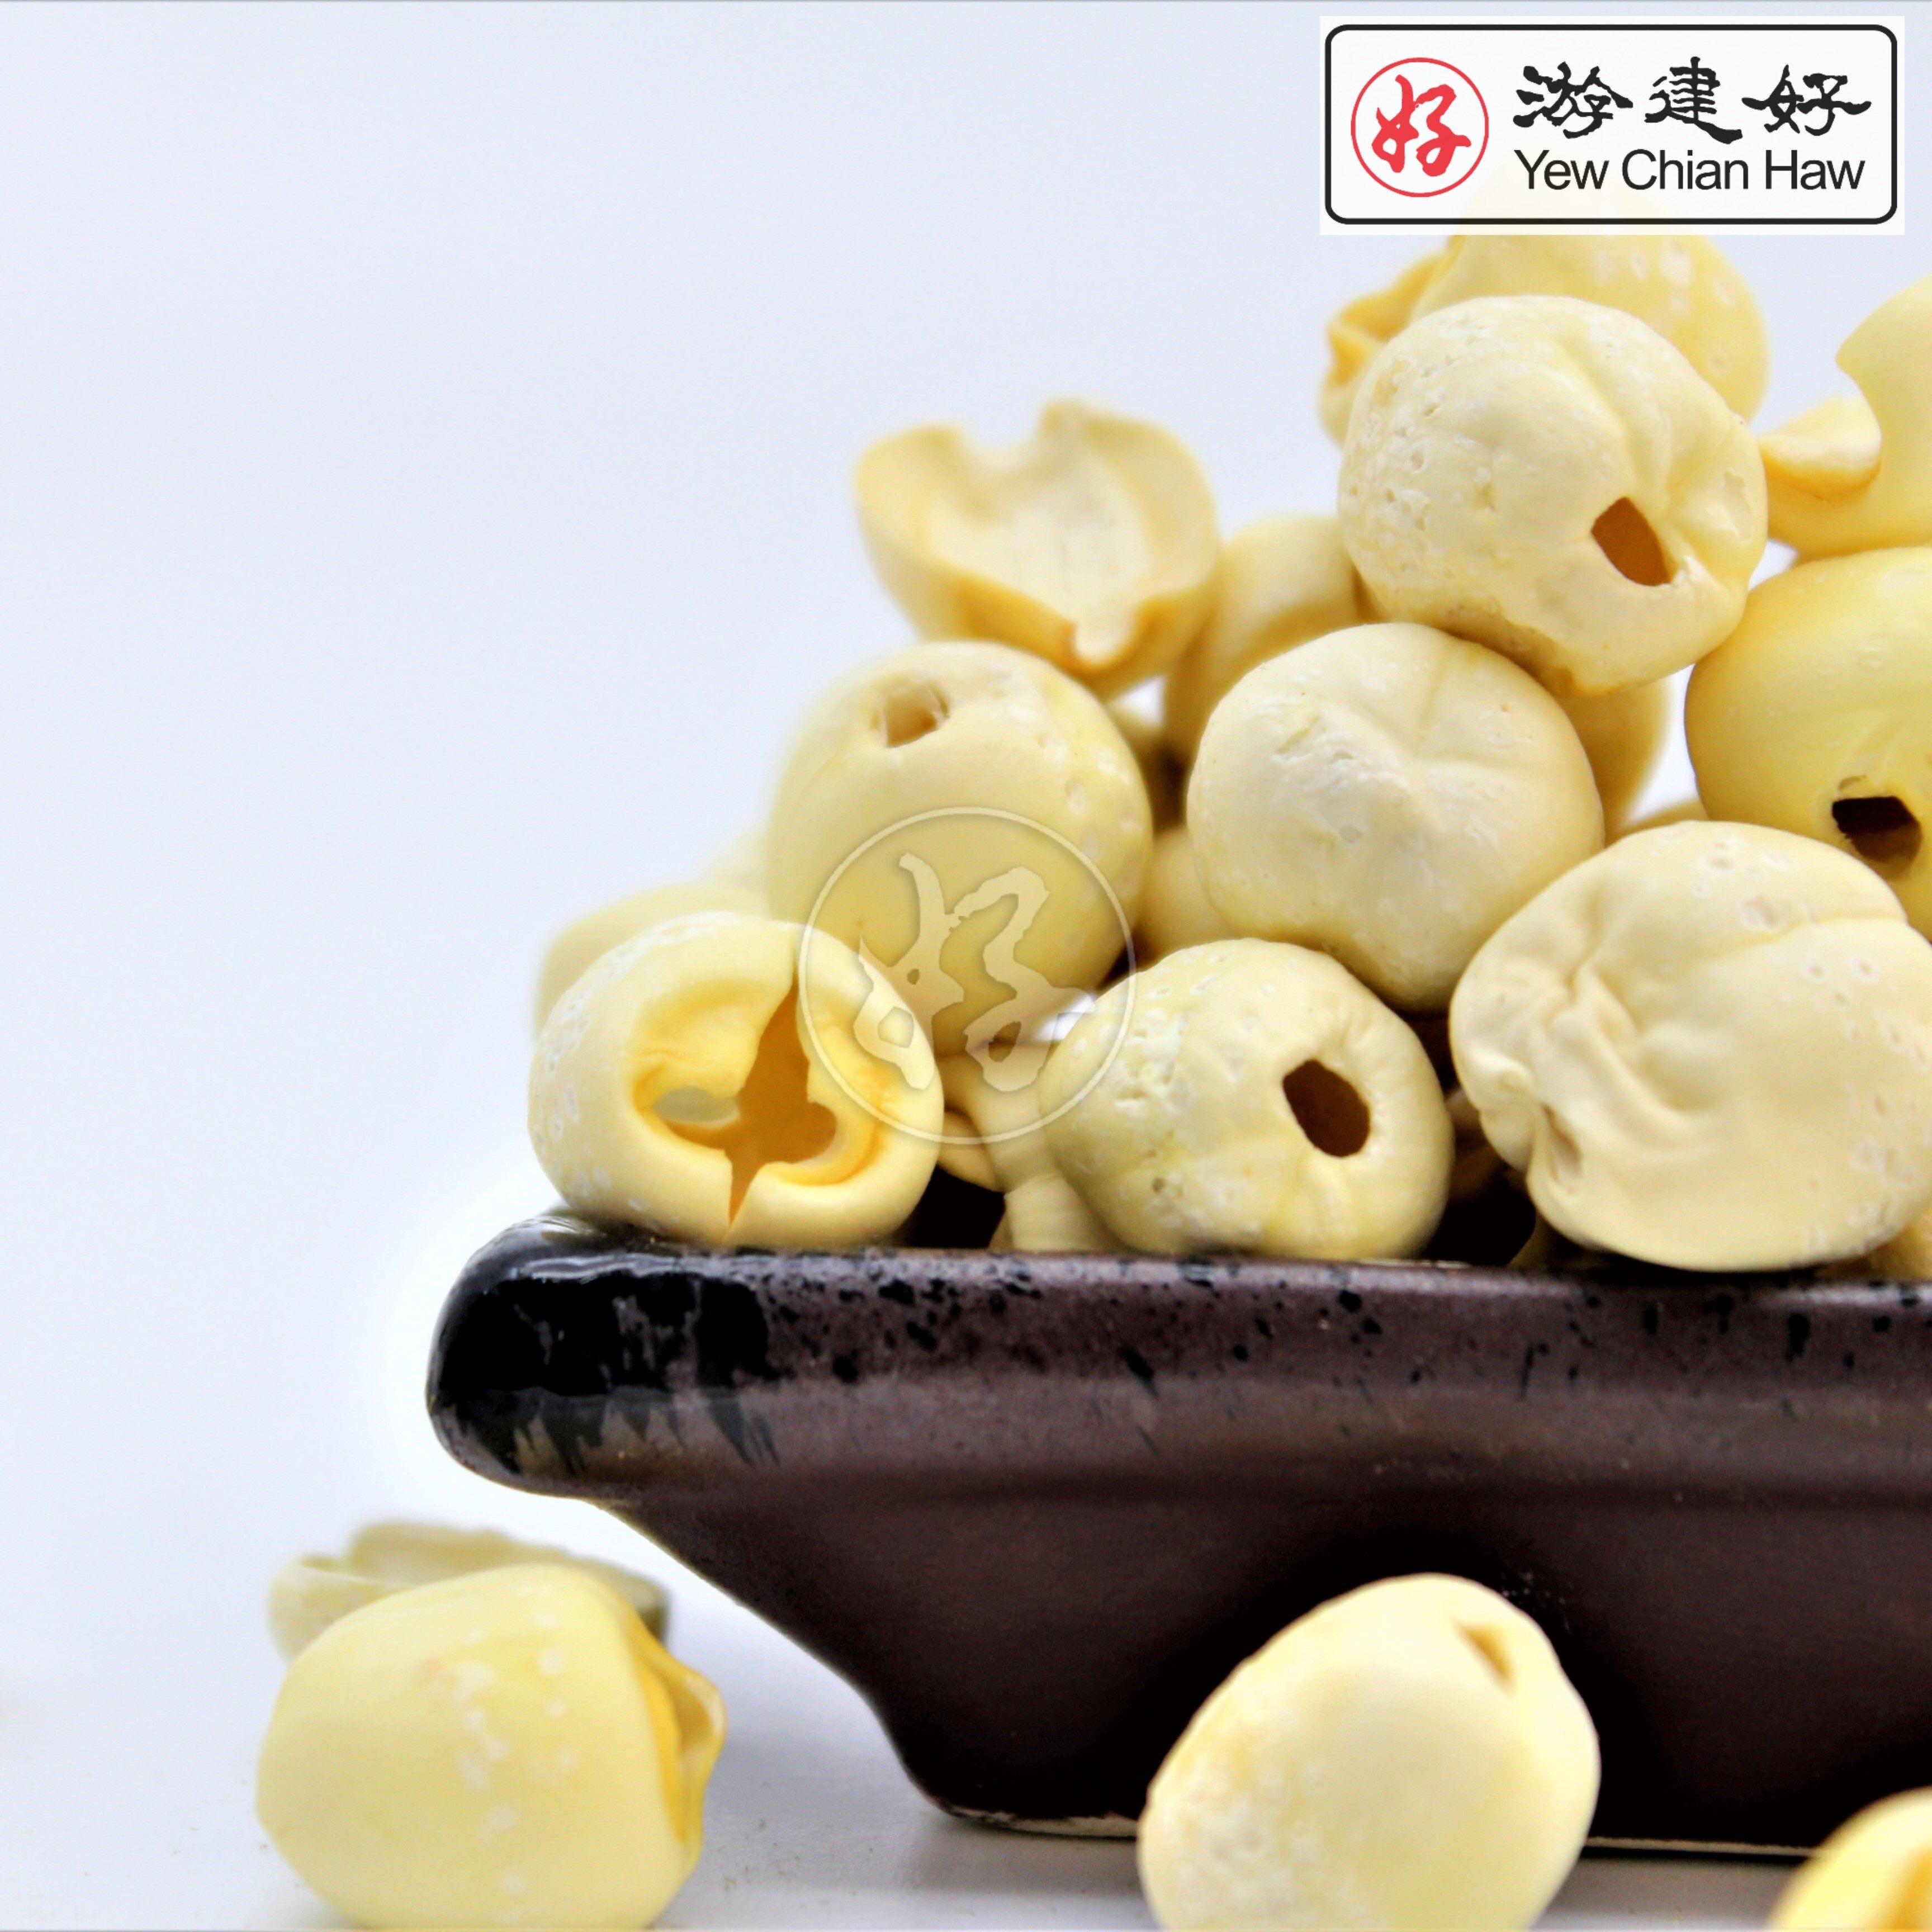 YCH Herbs 福建白蓮子袋裝 (130克) White Bai Lian Zi / Lotus Seed / Kacang Teratai (130g Pack) Semen Nelumbinis (2 years shelf life) HALALRM